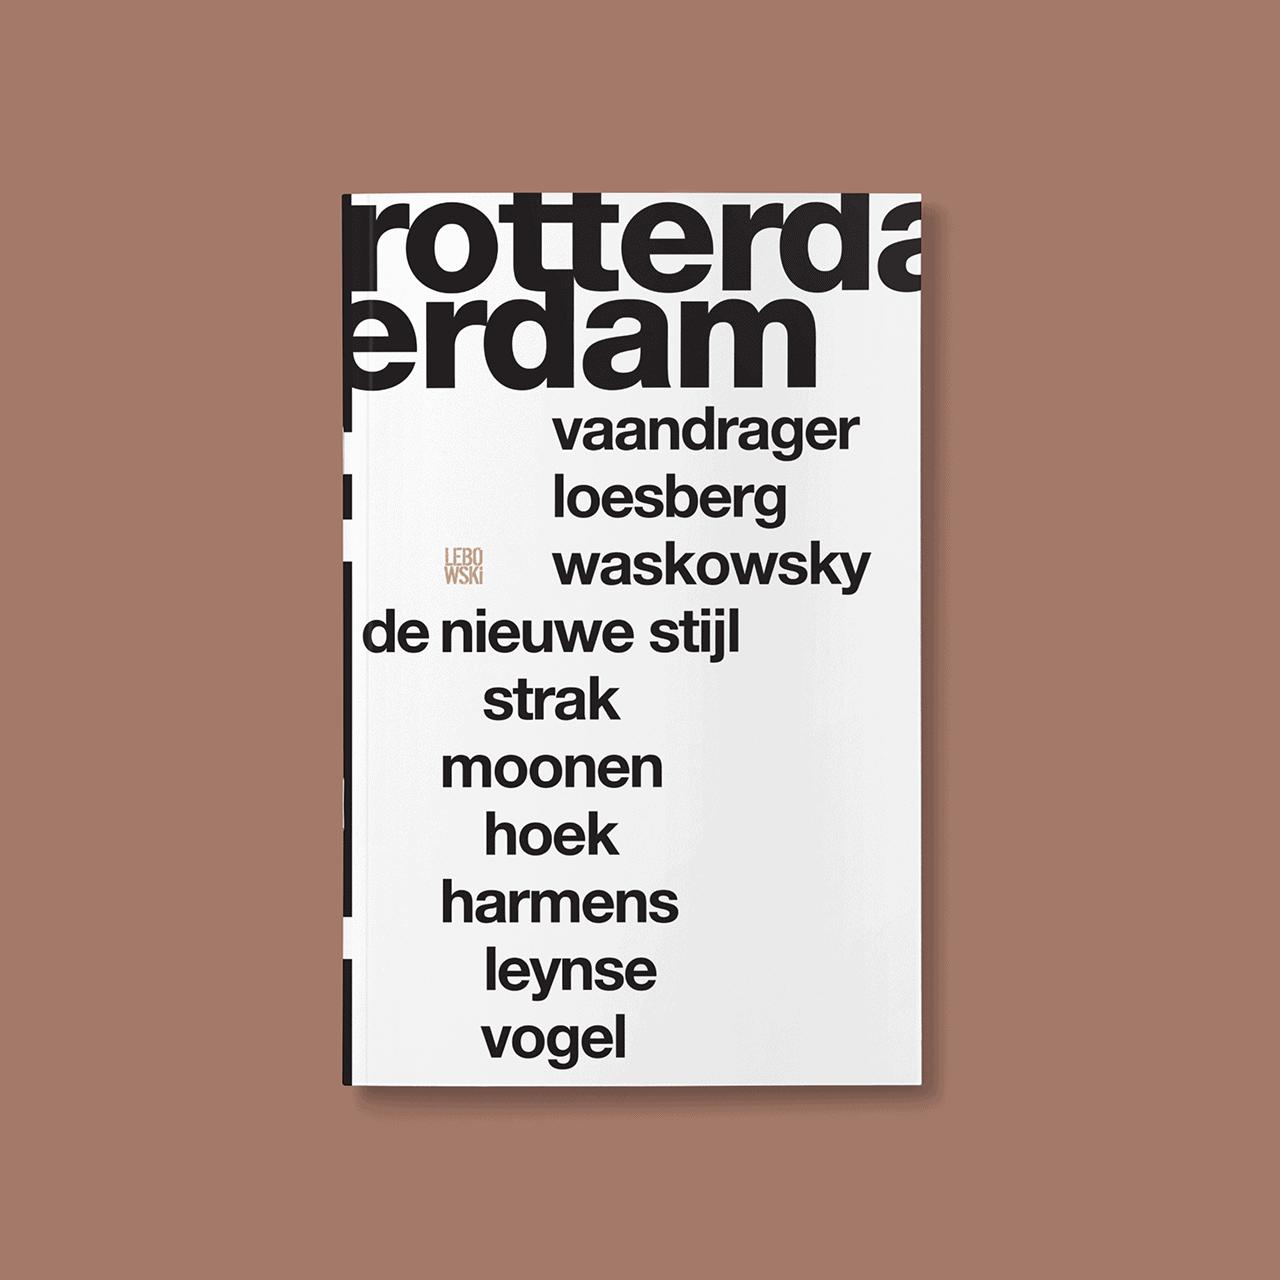 Rotterdam_Thumb_front